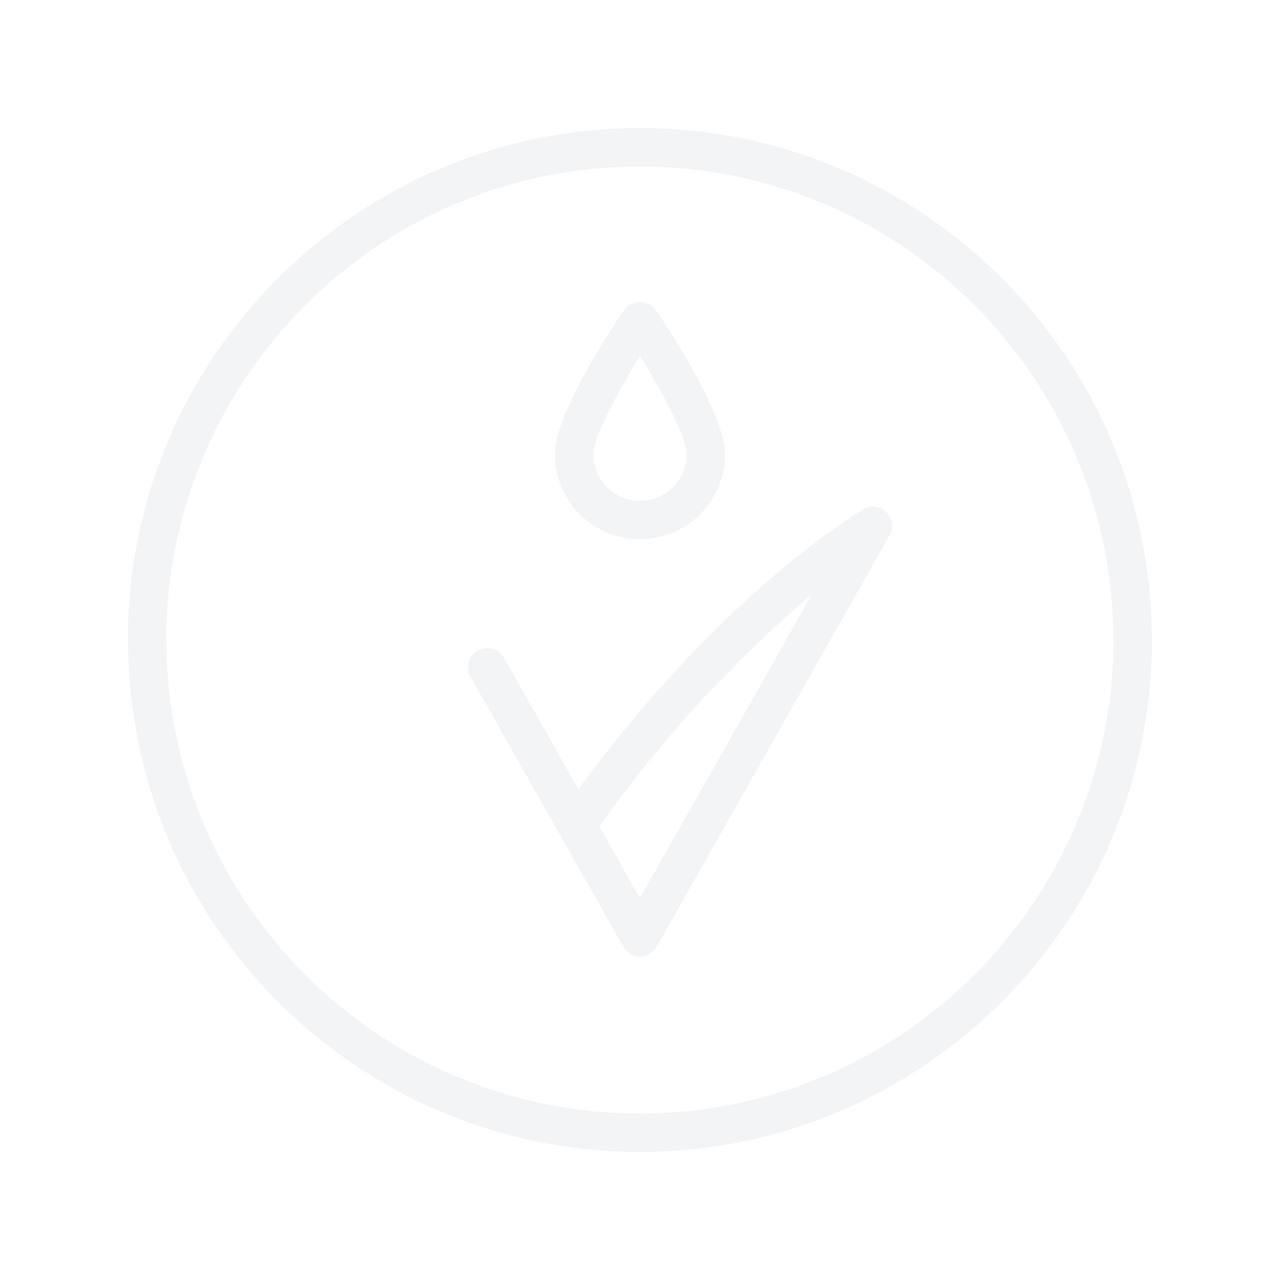 TAHE Organic Care Tecnic Waves Hair Cream For Curly Hair 100ml